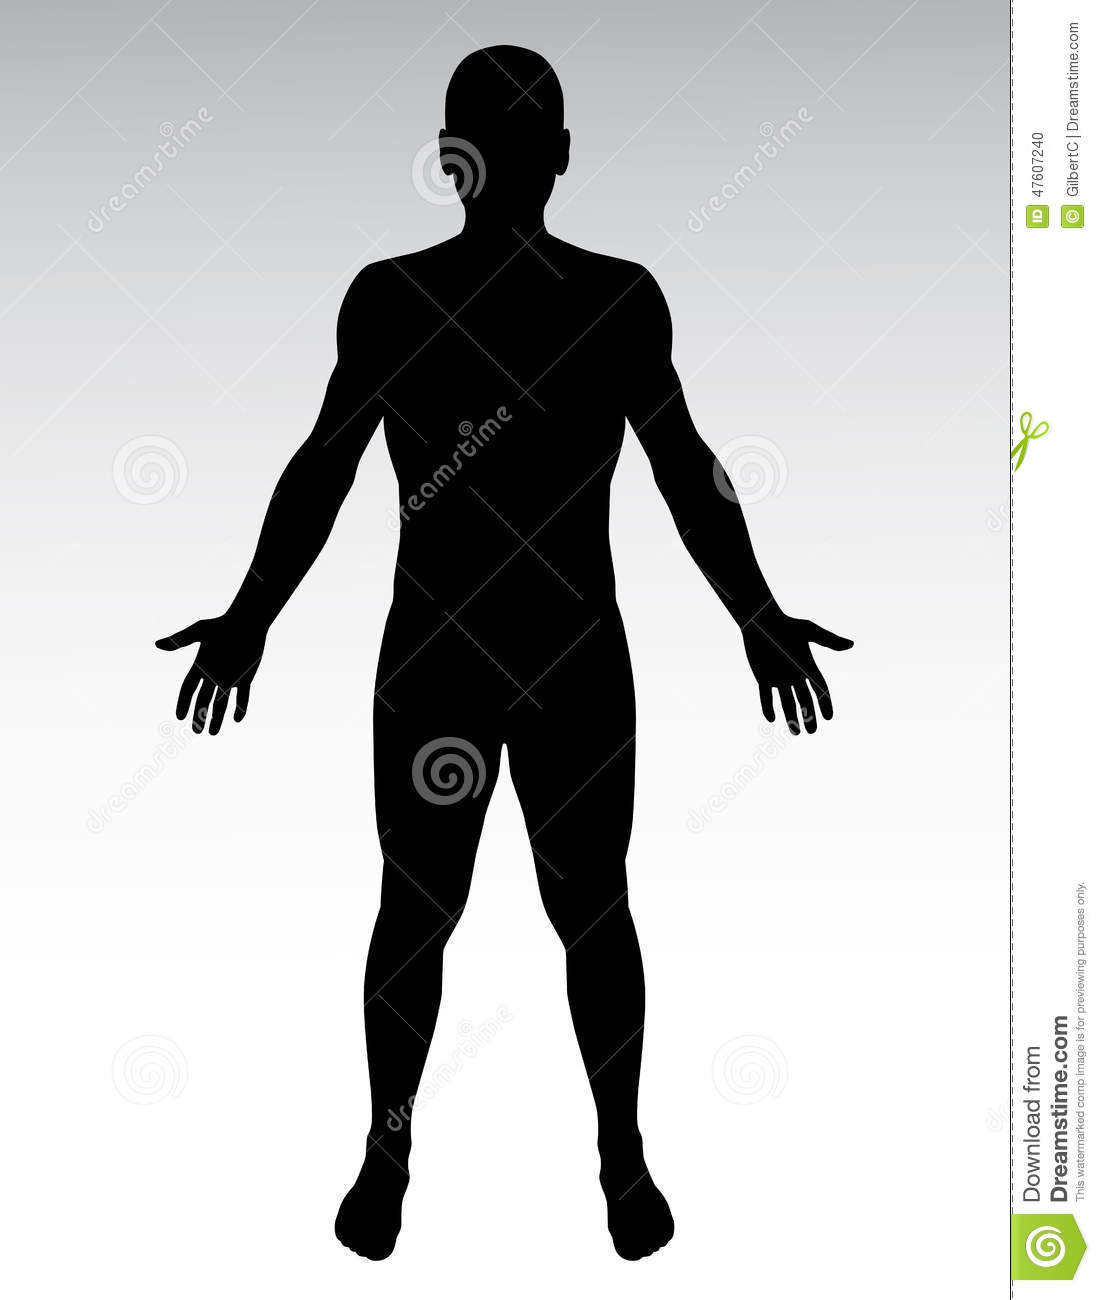 Human Body Silhouette Vector